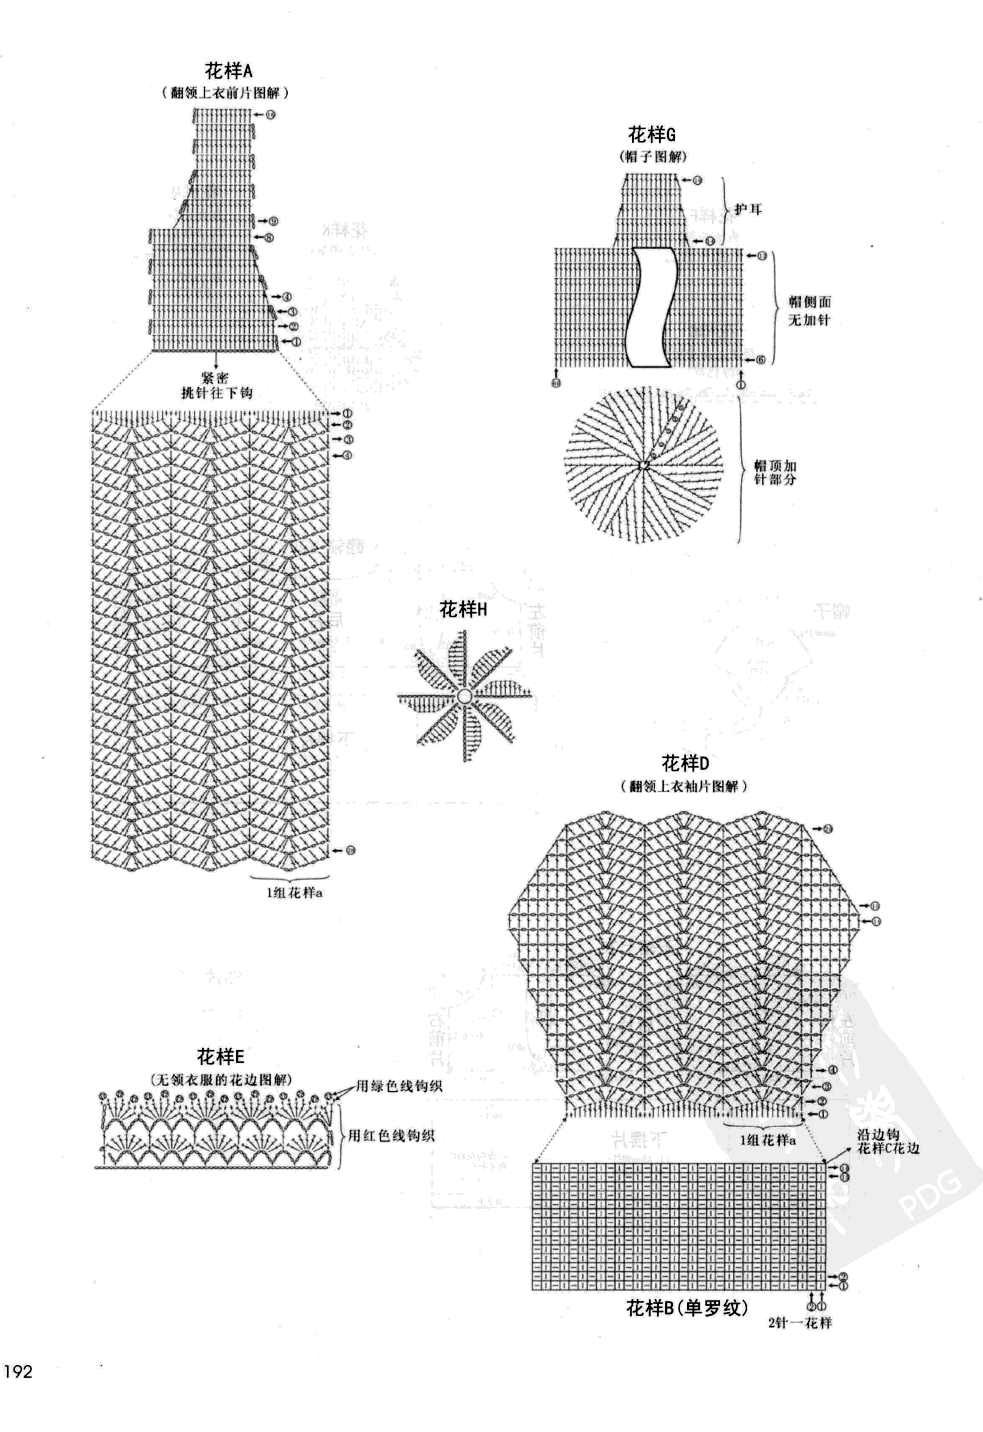 p (192).jpg